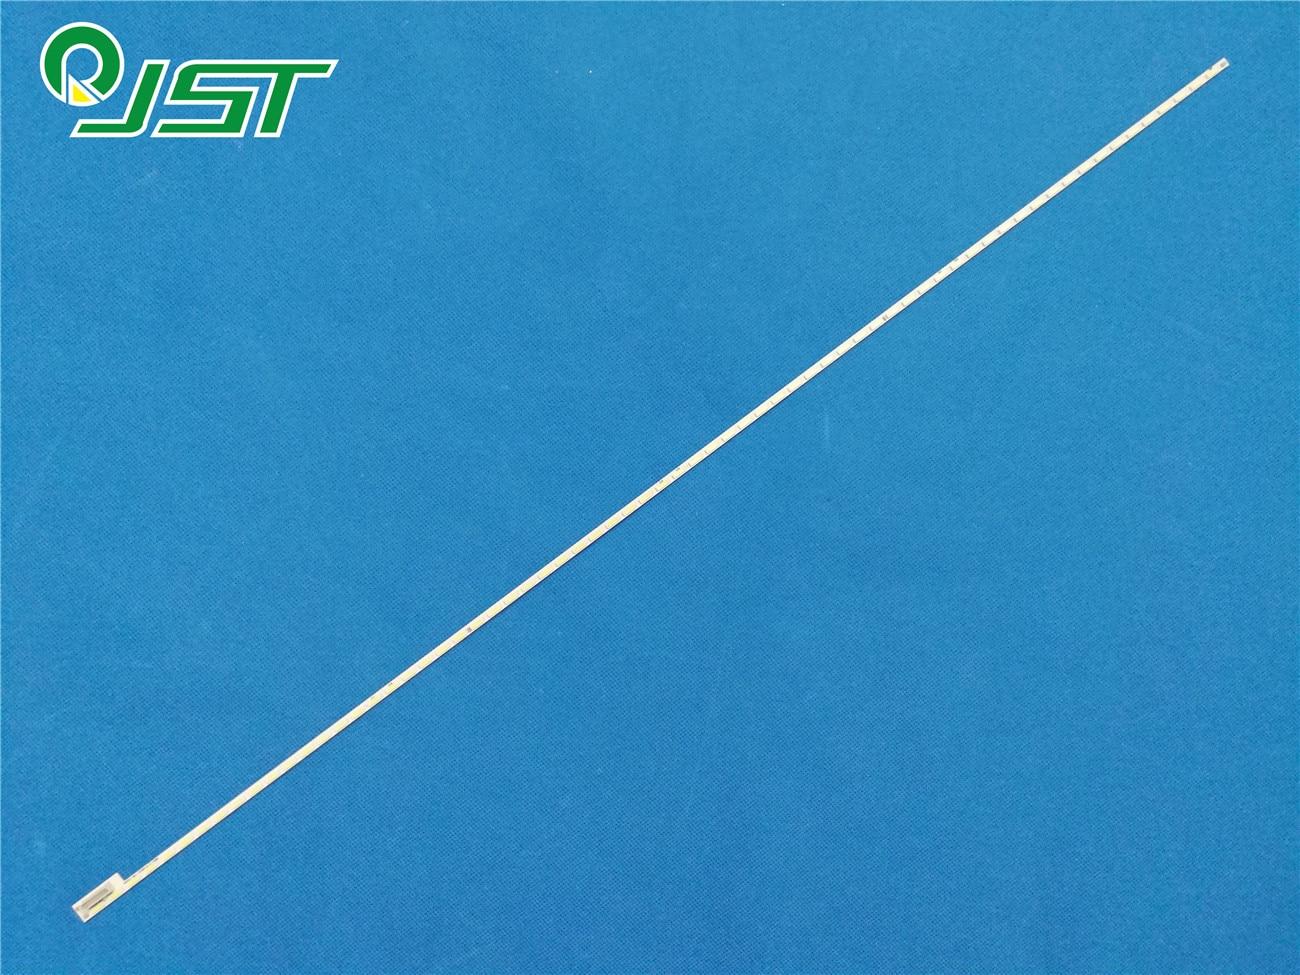 100% nuevo 1 uds/Kit de tiras LED para TOSHIBA 50 TV 50L1400U 50L2400U 50L3400U 50L1400UC V500HJ1 ME1 V500H1 ME1 TLEM9